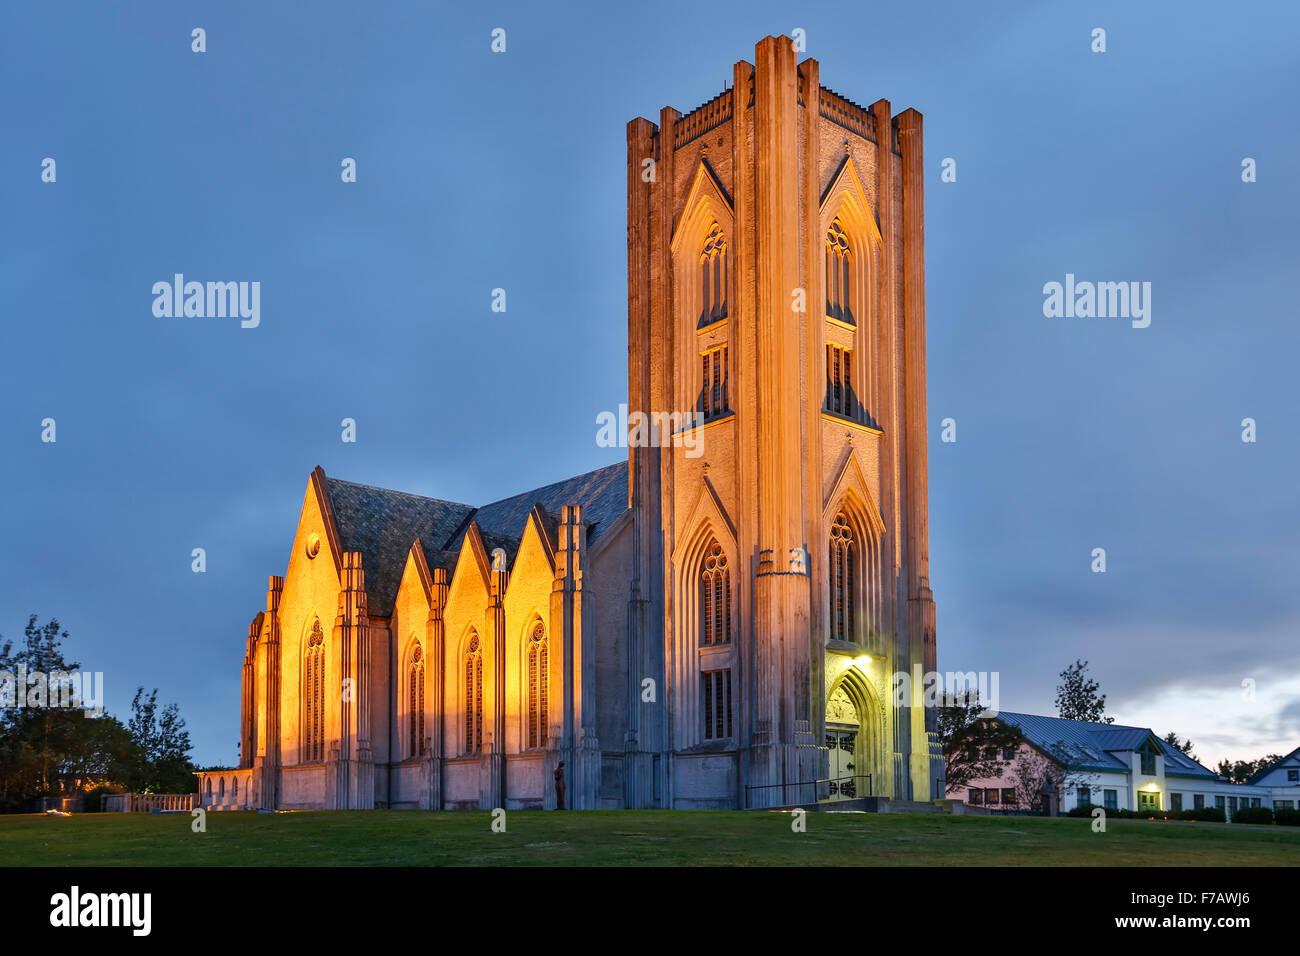 Cathédrale catholique du Christ Roi, Reykjavik, Islande Photo Stock